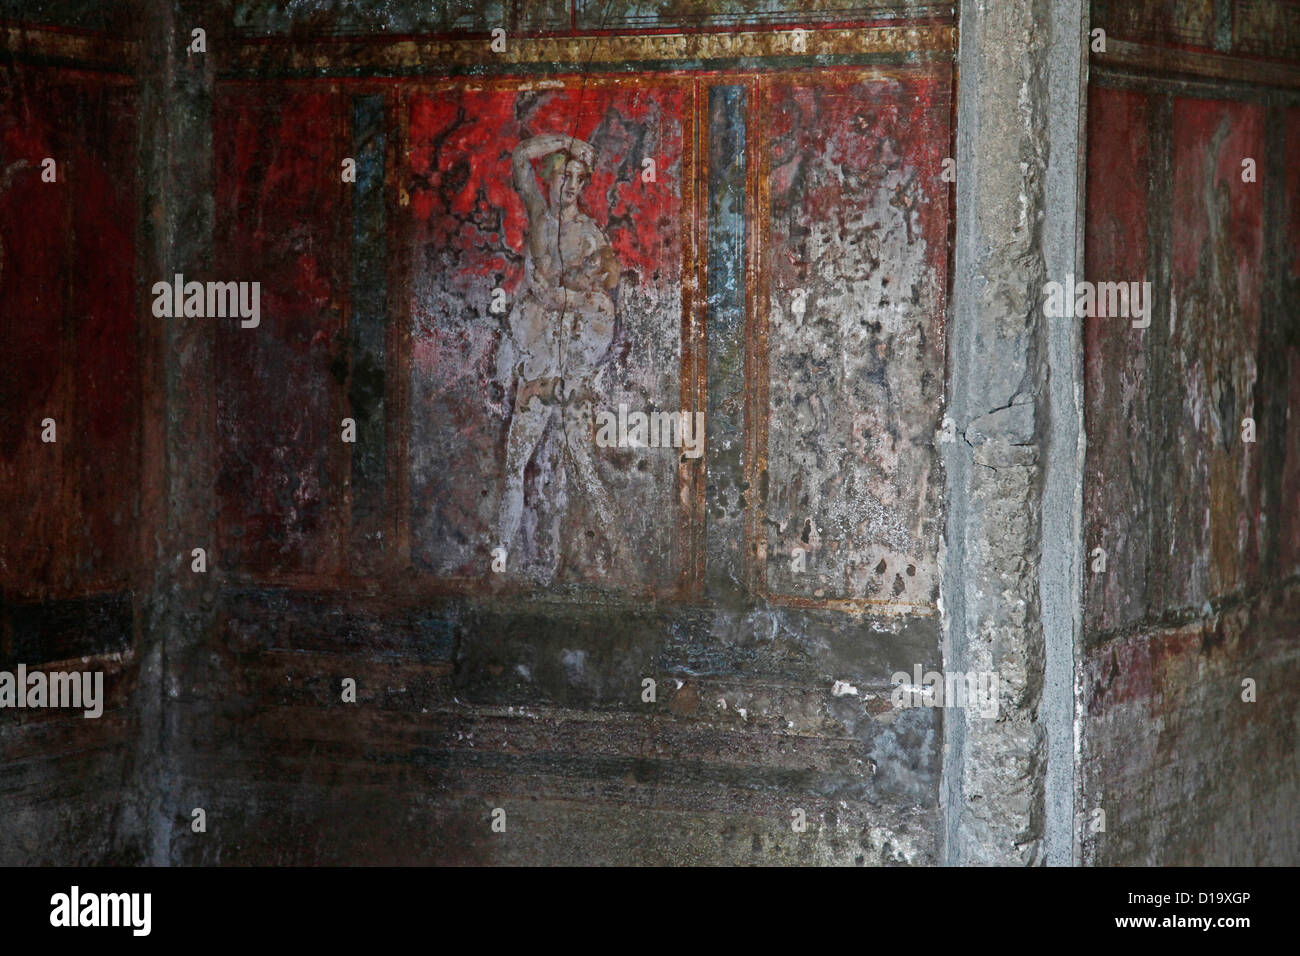 Italy, Campania, Pompei, fresco of Villa dei Misteri - Stock Image